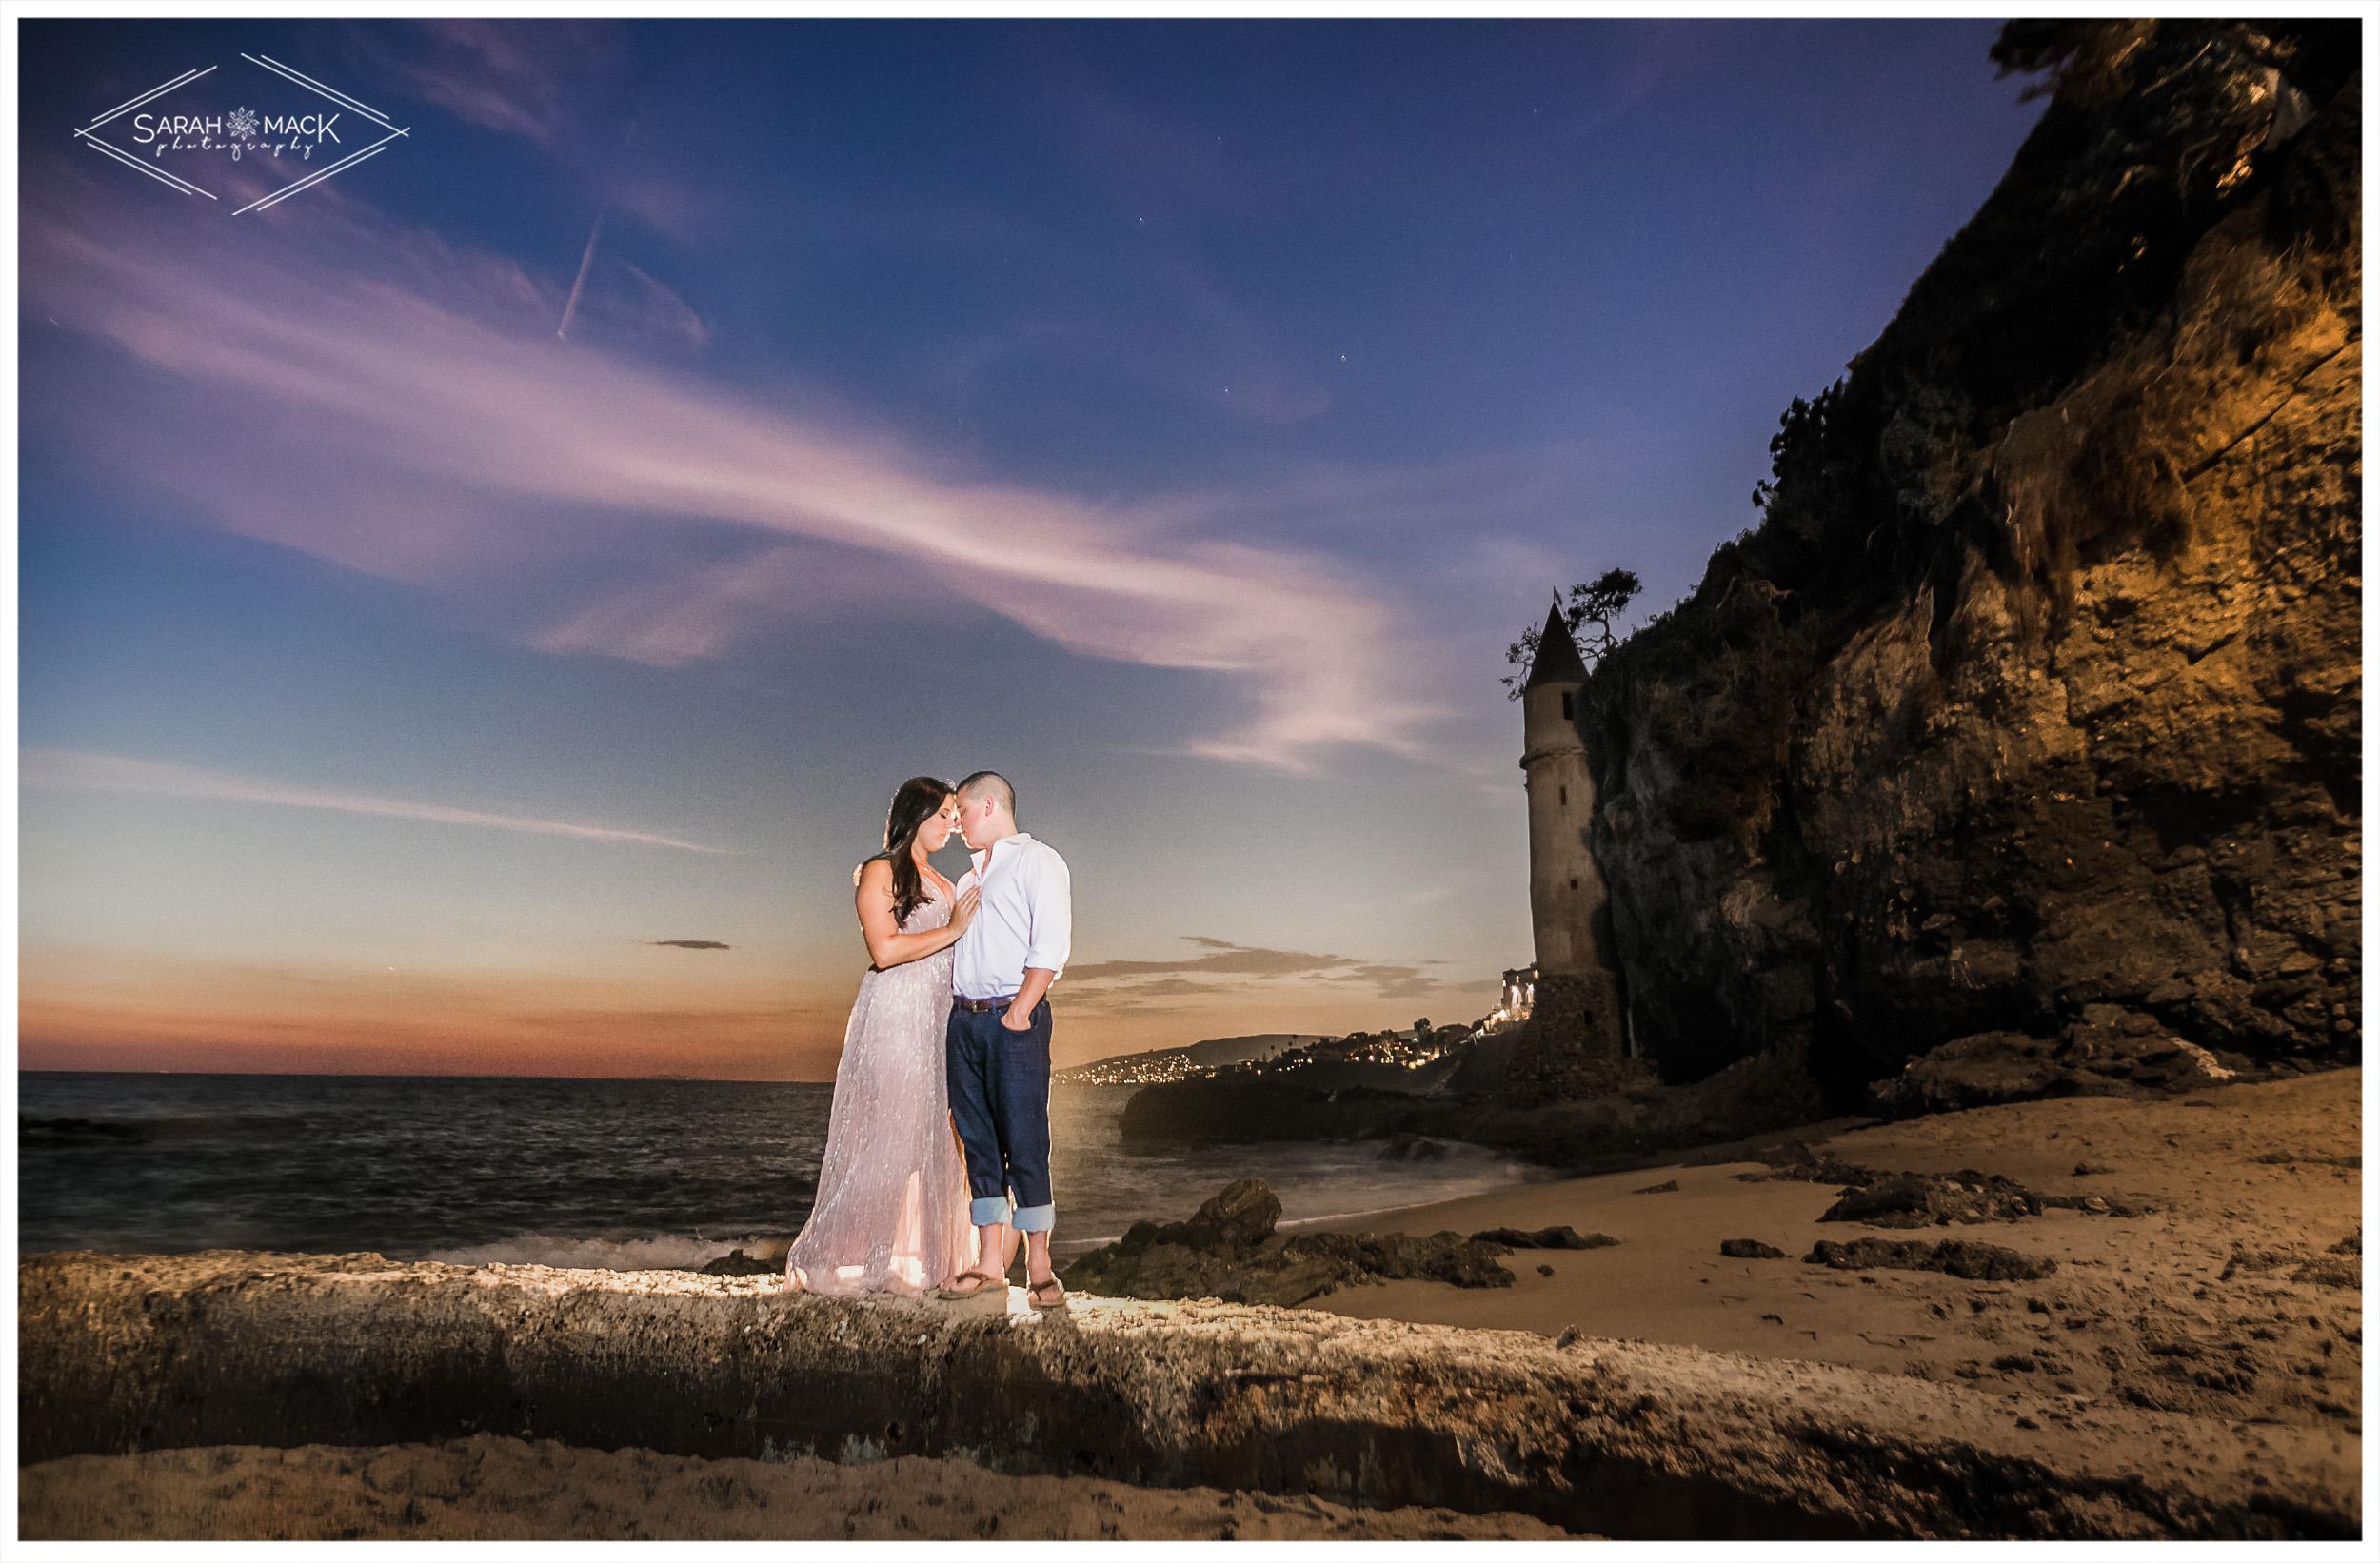 TM-Laguna-Beach-Orange-County-Engagement-Photography-21.jpg